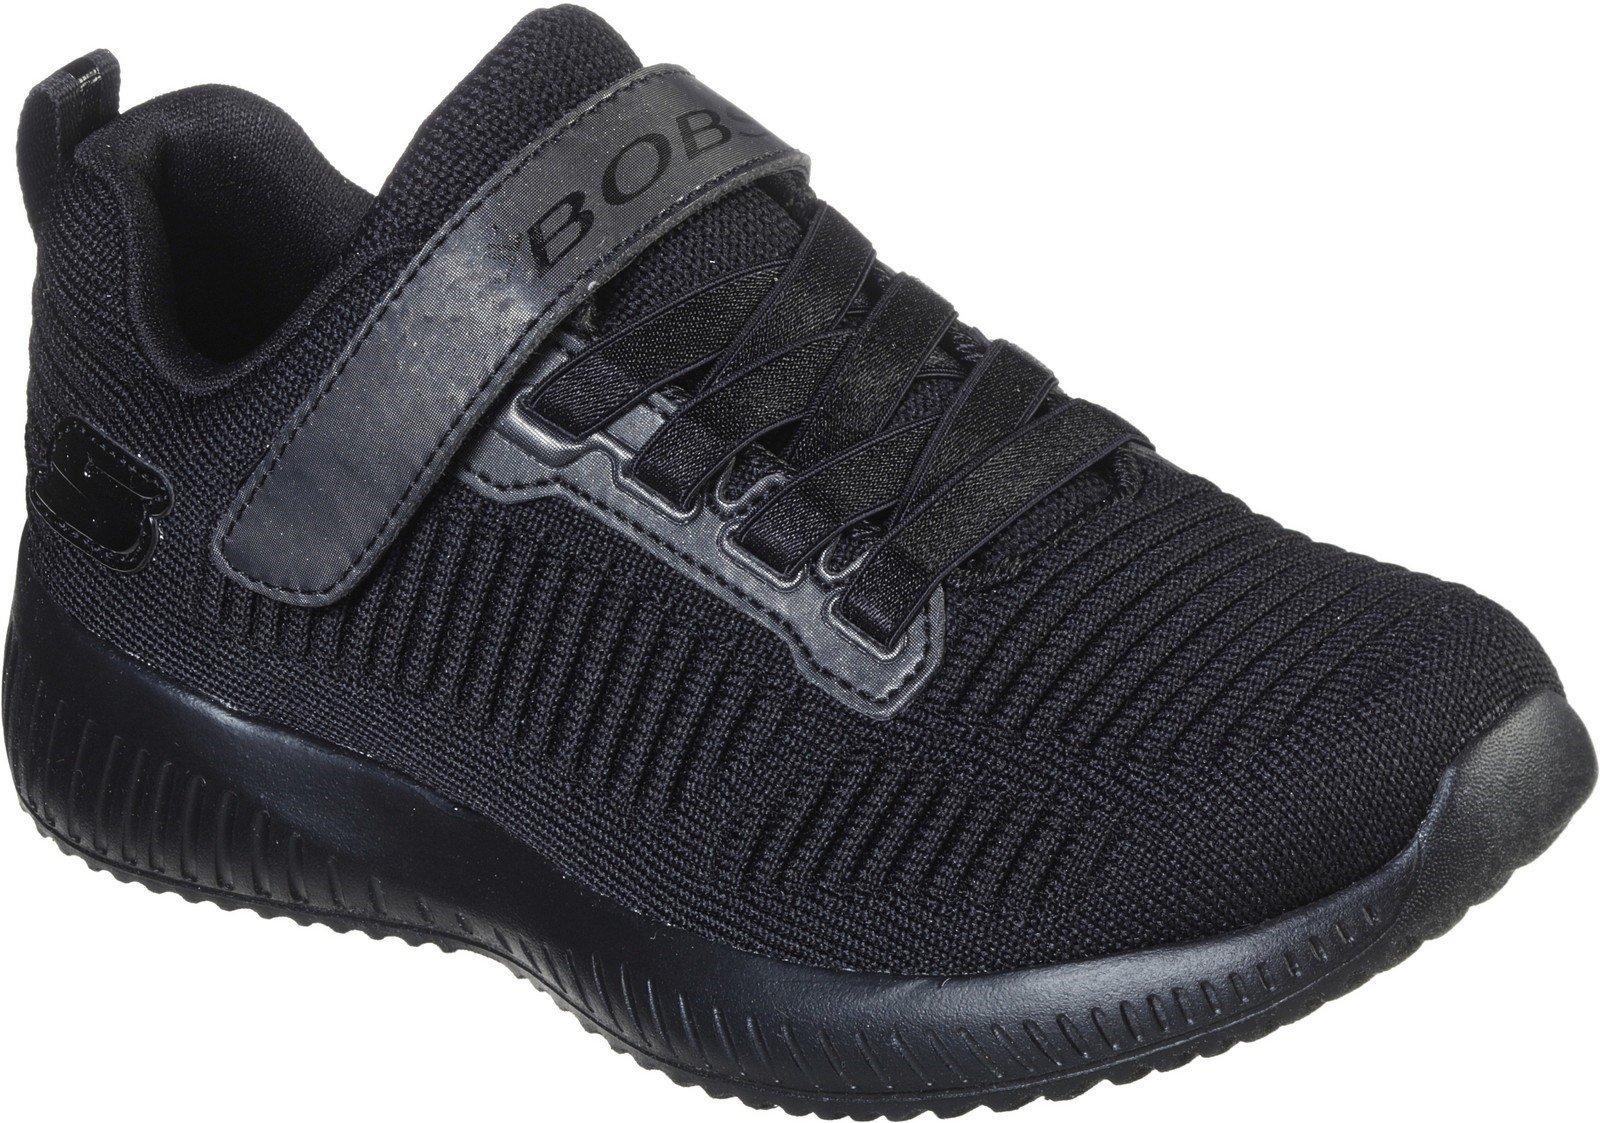 Skechers Kid's Sport Squad Charm League Trainer Black 30899 - Black/Black 10.5